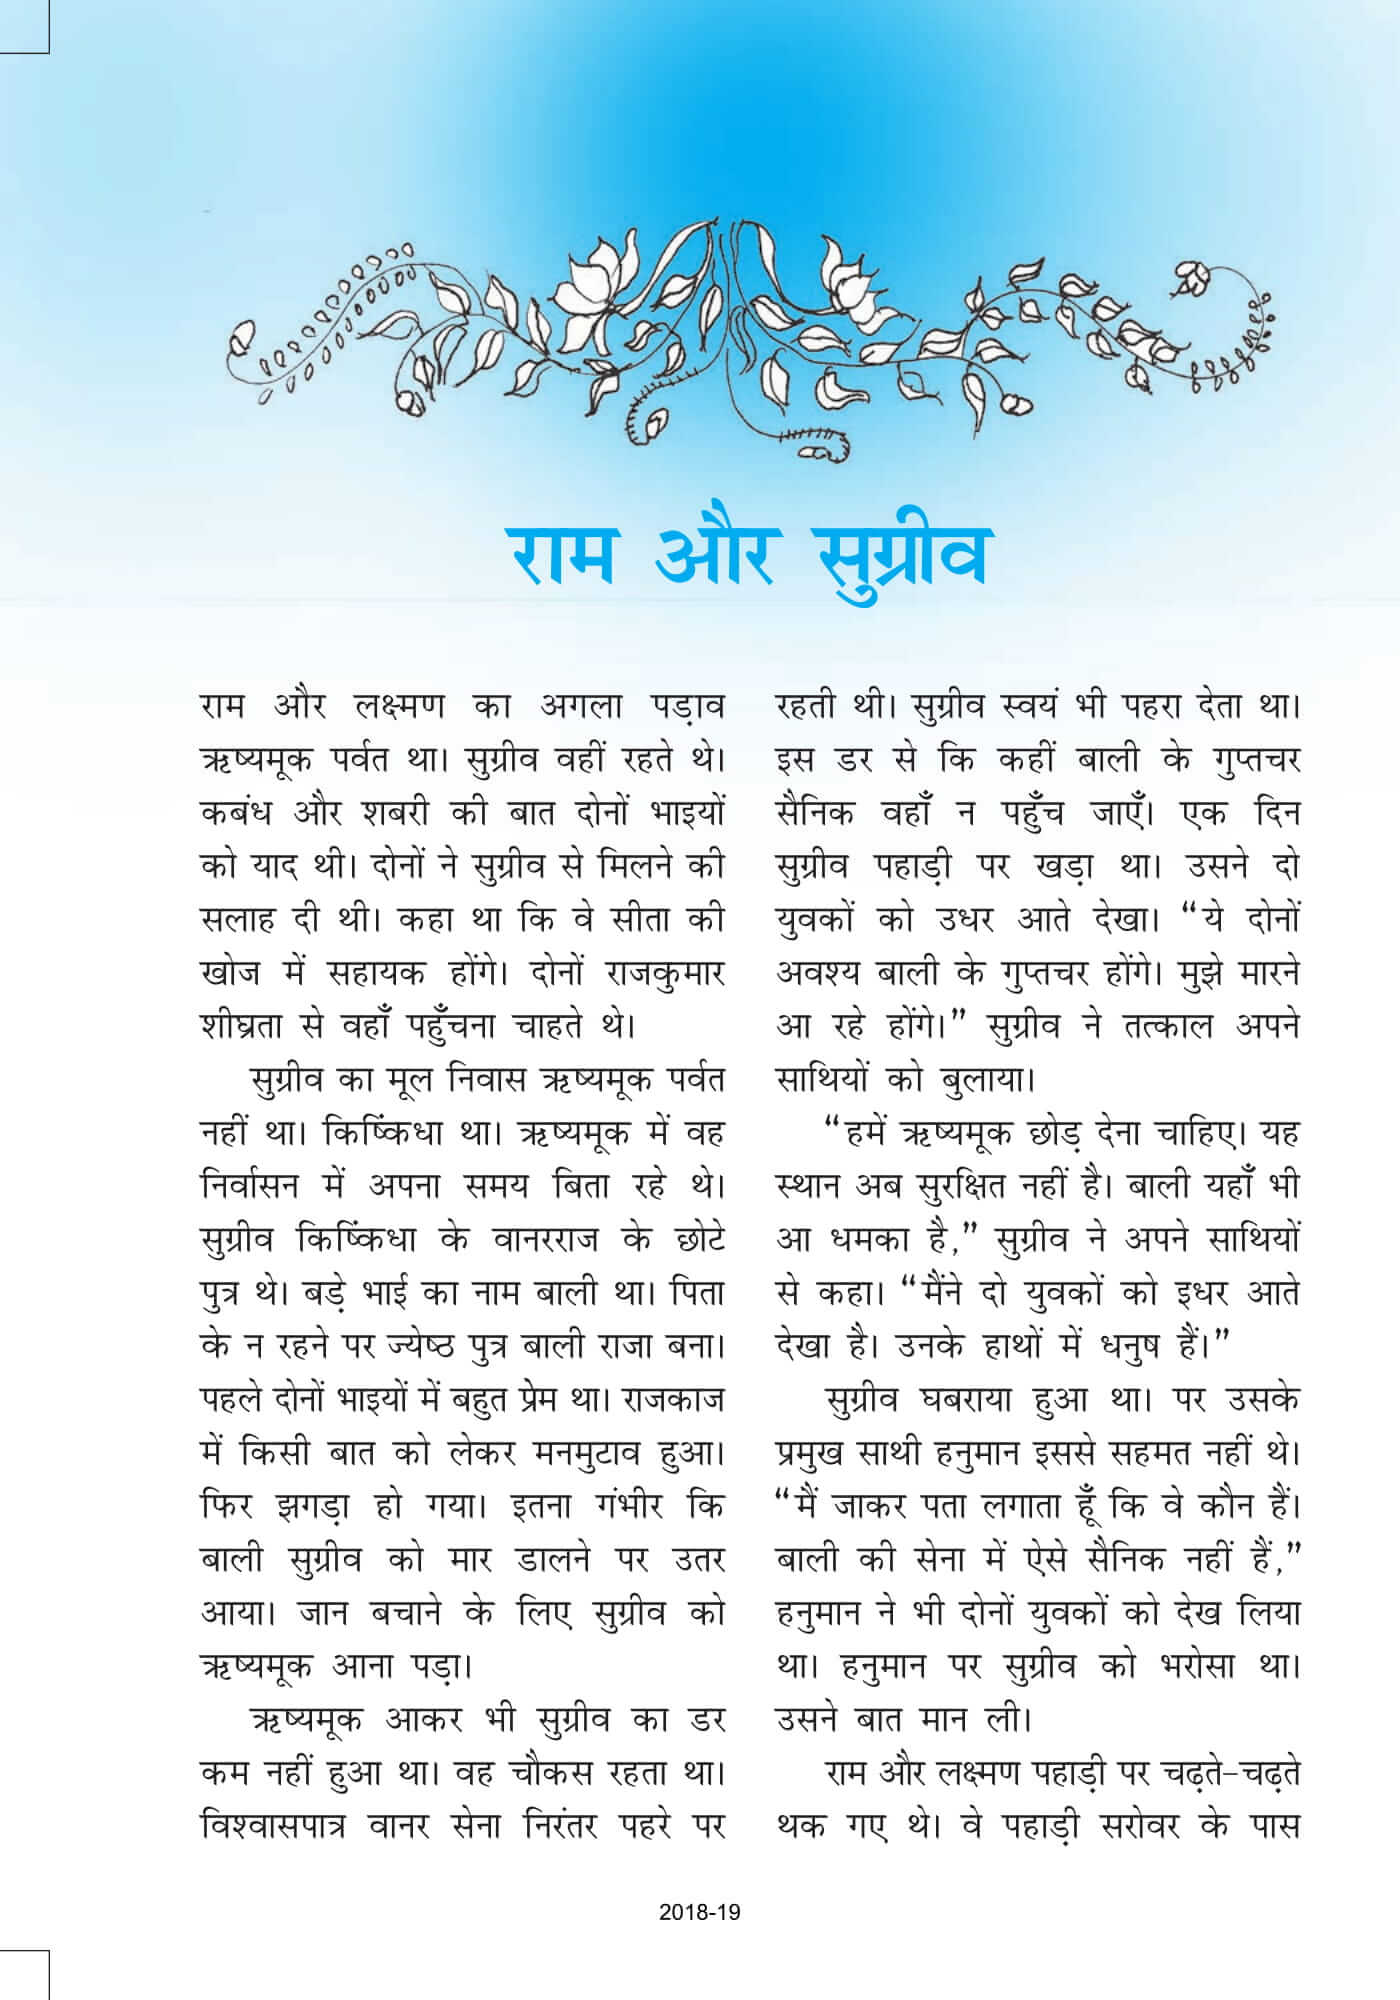 NCERT Solutions For Class 6 Hindi Bal Ram Katha Chapter 9